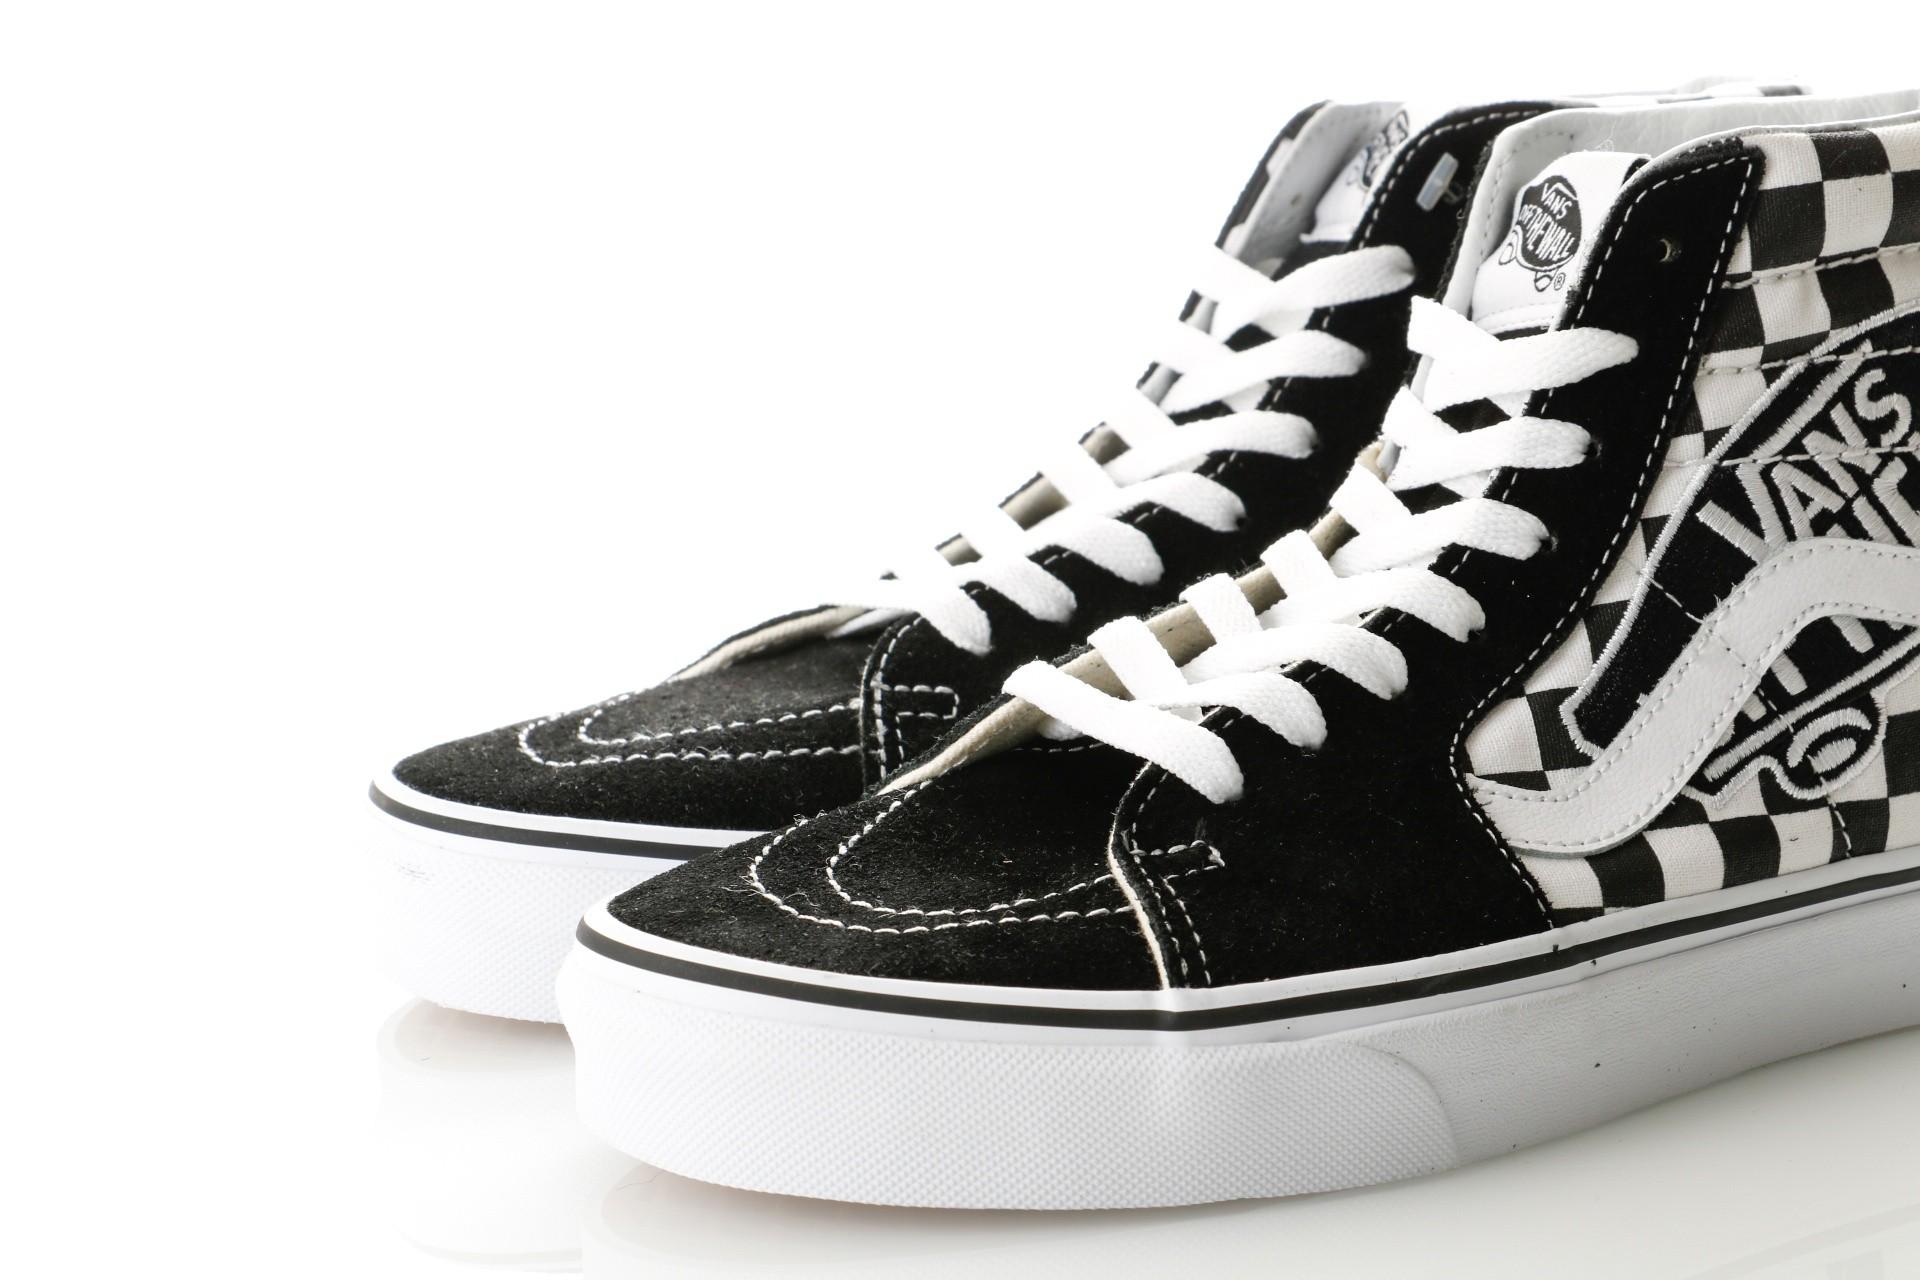 b984a75b42 Afbeelding van Vans UA SK8-Hi VA38GEUPV Sneakers (Vans Patch) black true